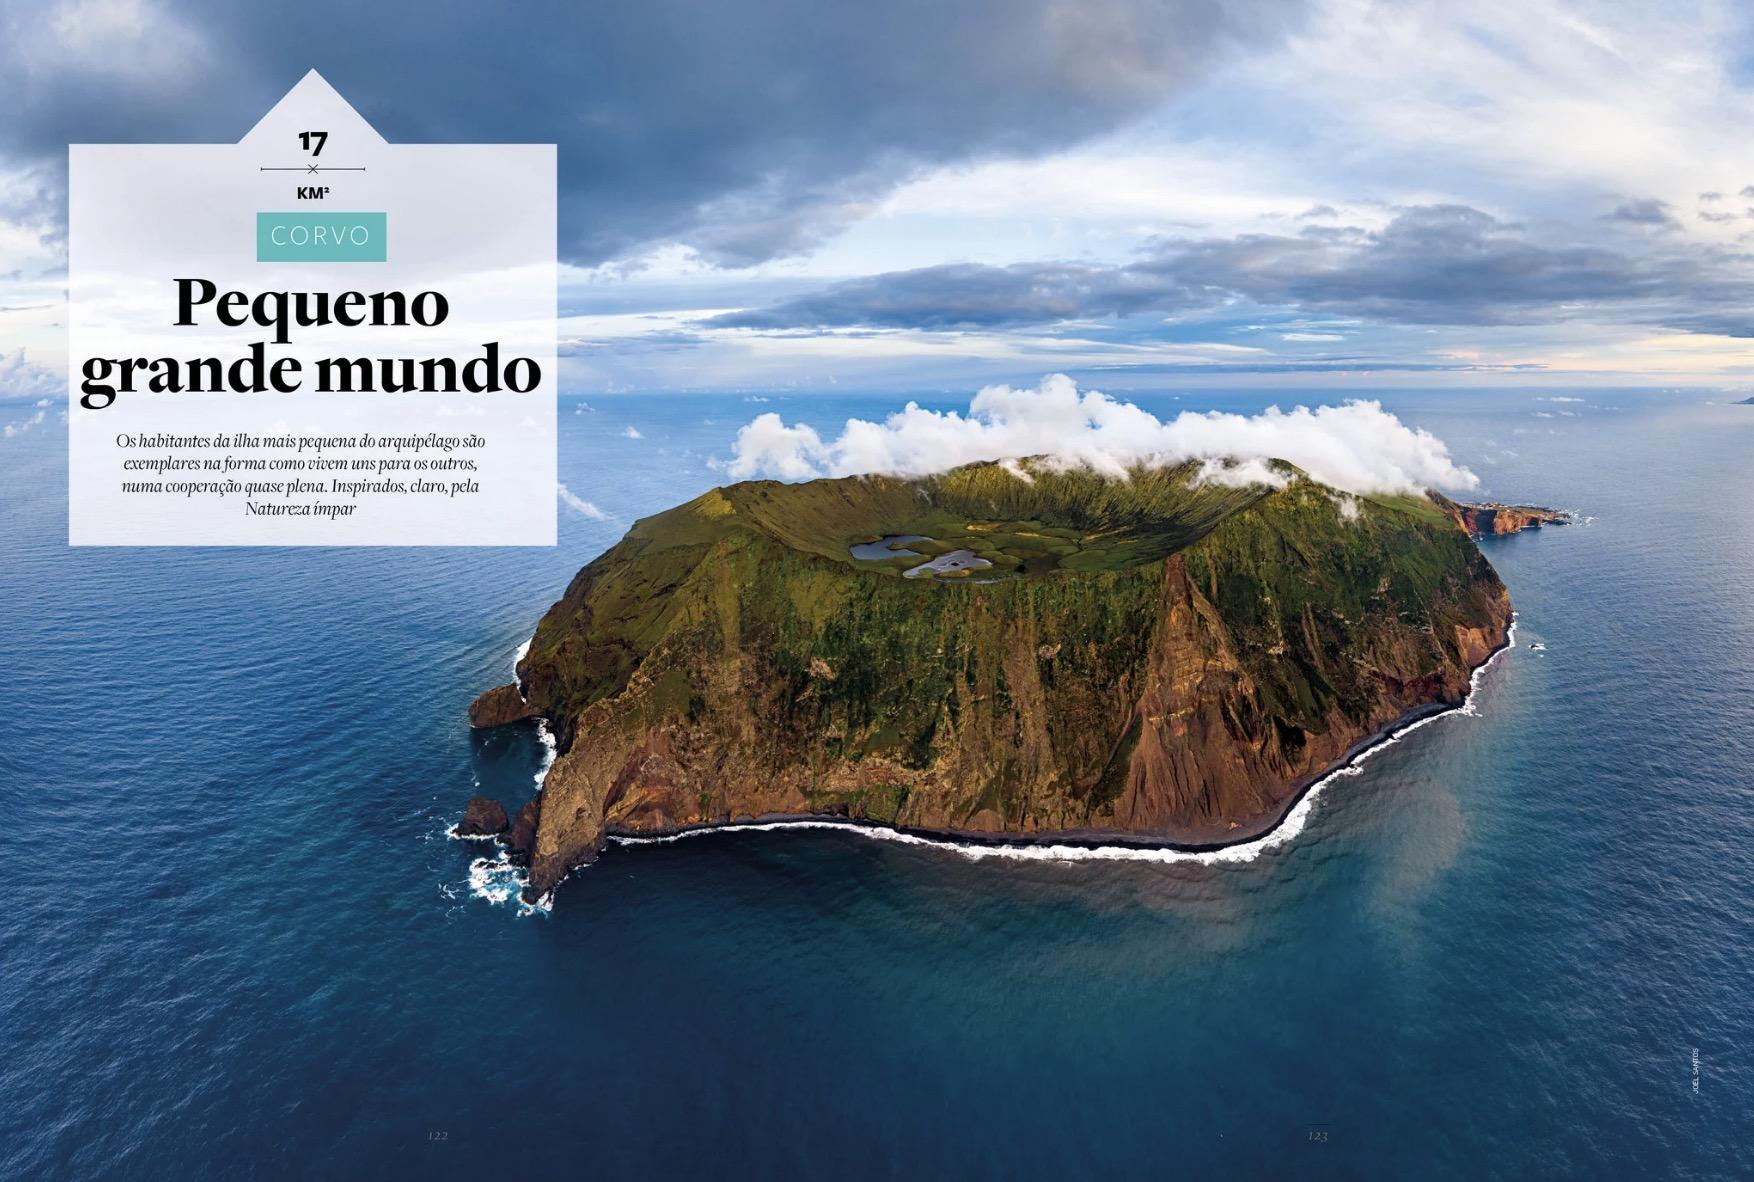 VISAO-ACORES-ESPECIAL-GUIA-PARAISO-JOEL-SANTOS-2.jpg